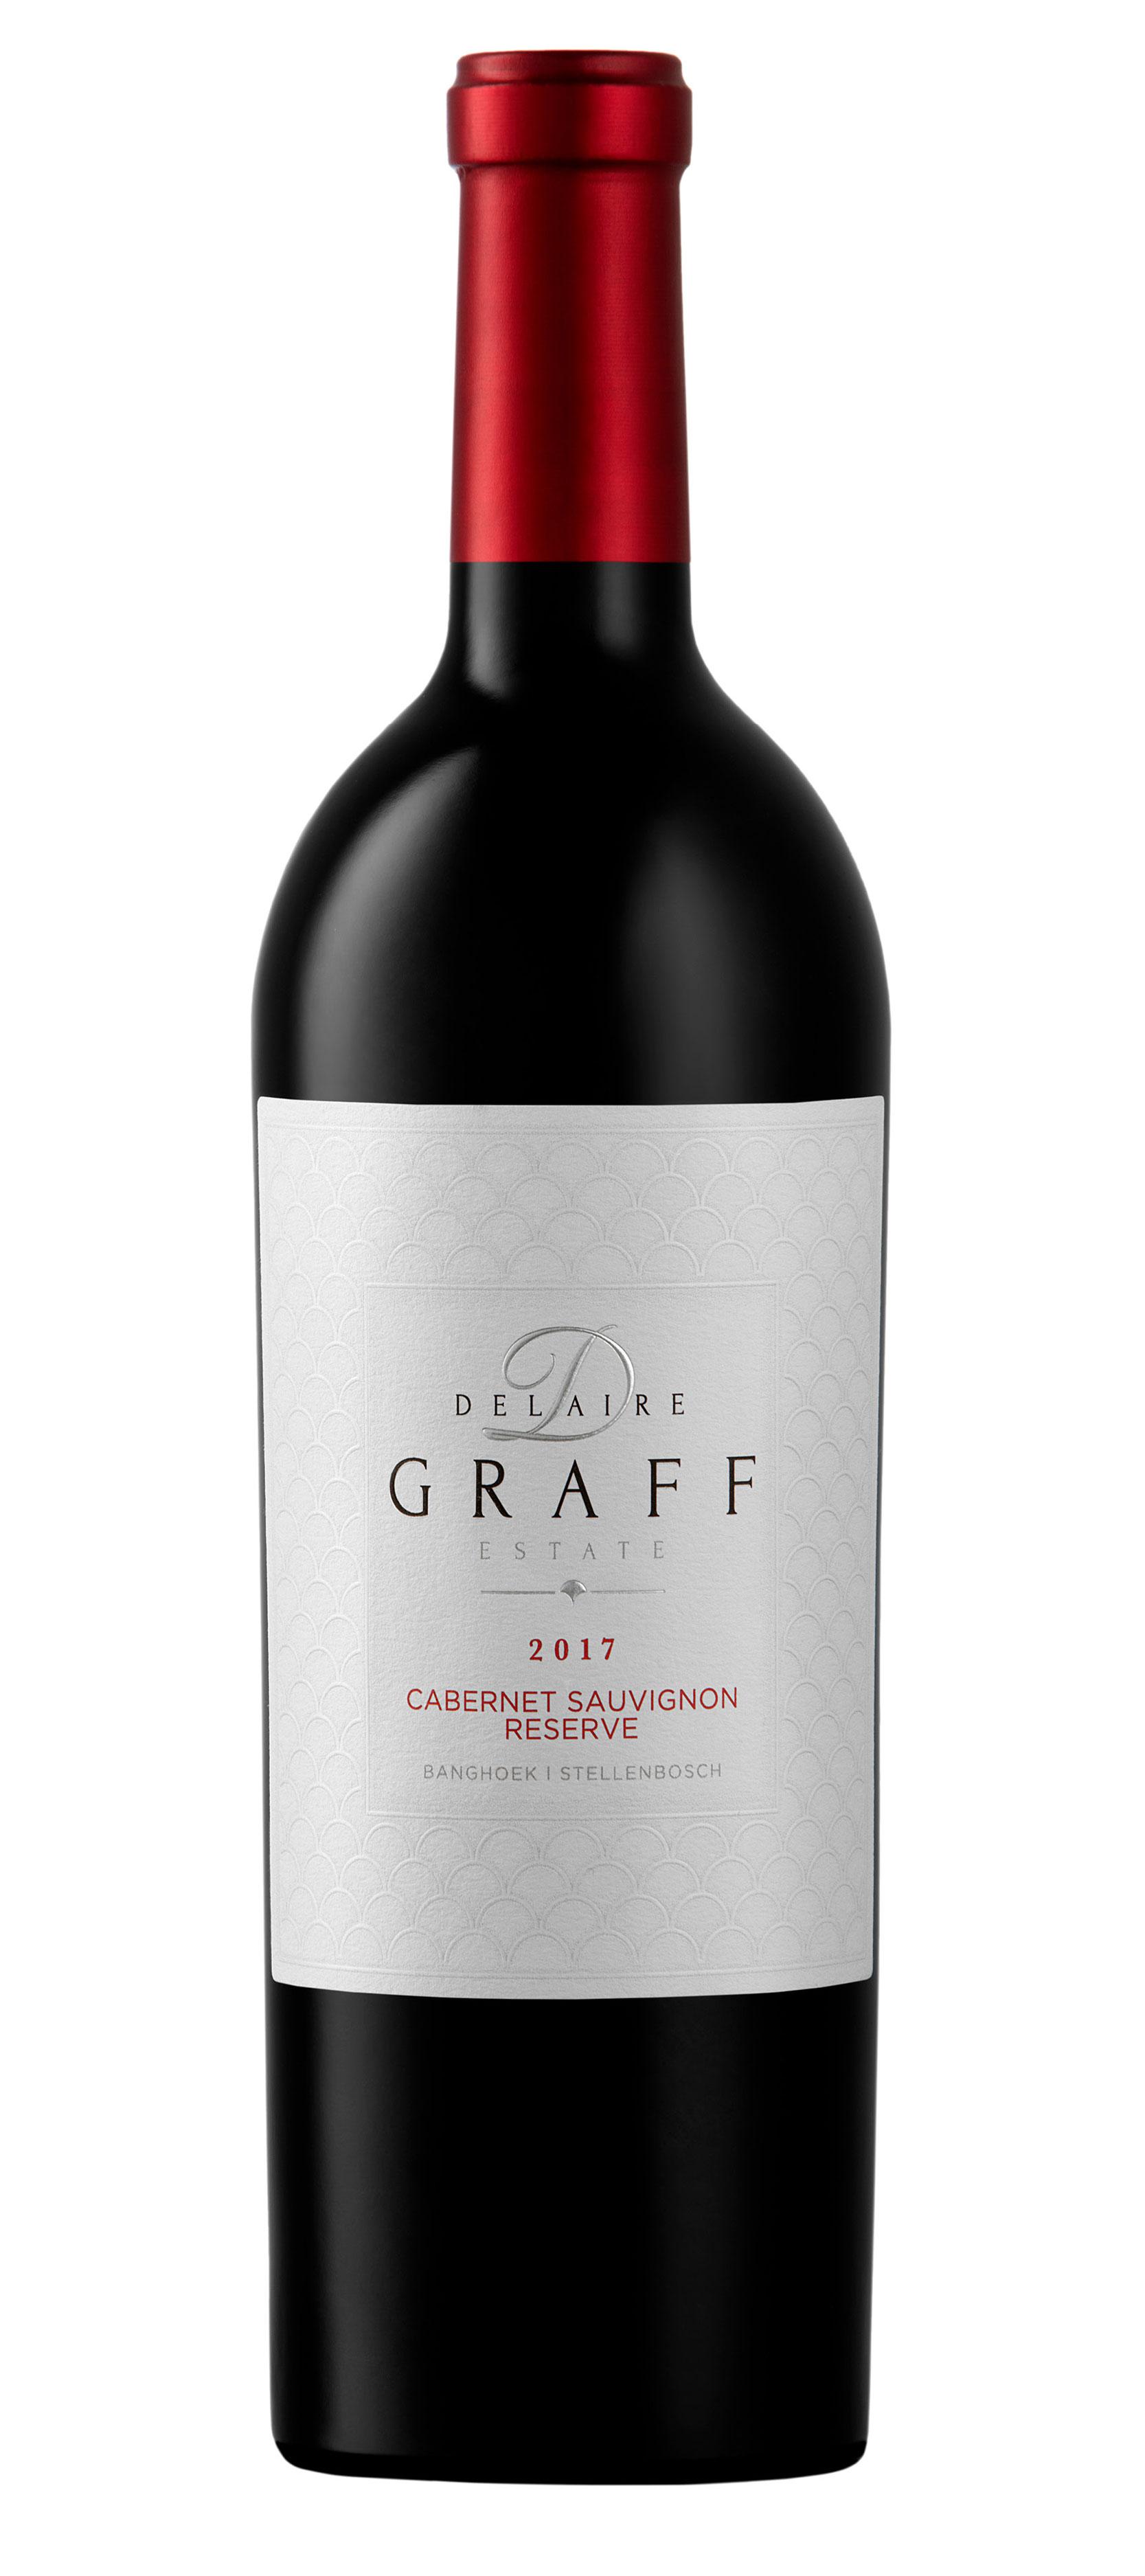 A bottle of Delaire Graff Cabernet Sauvignon Reserve 2017